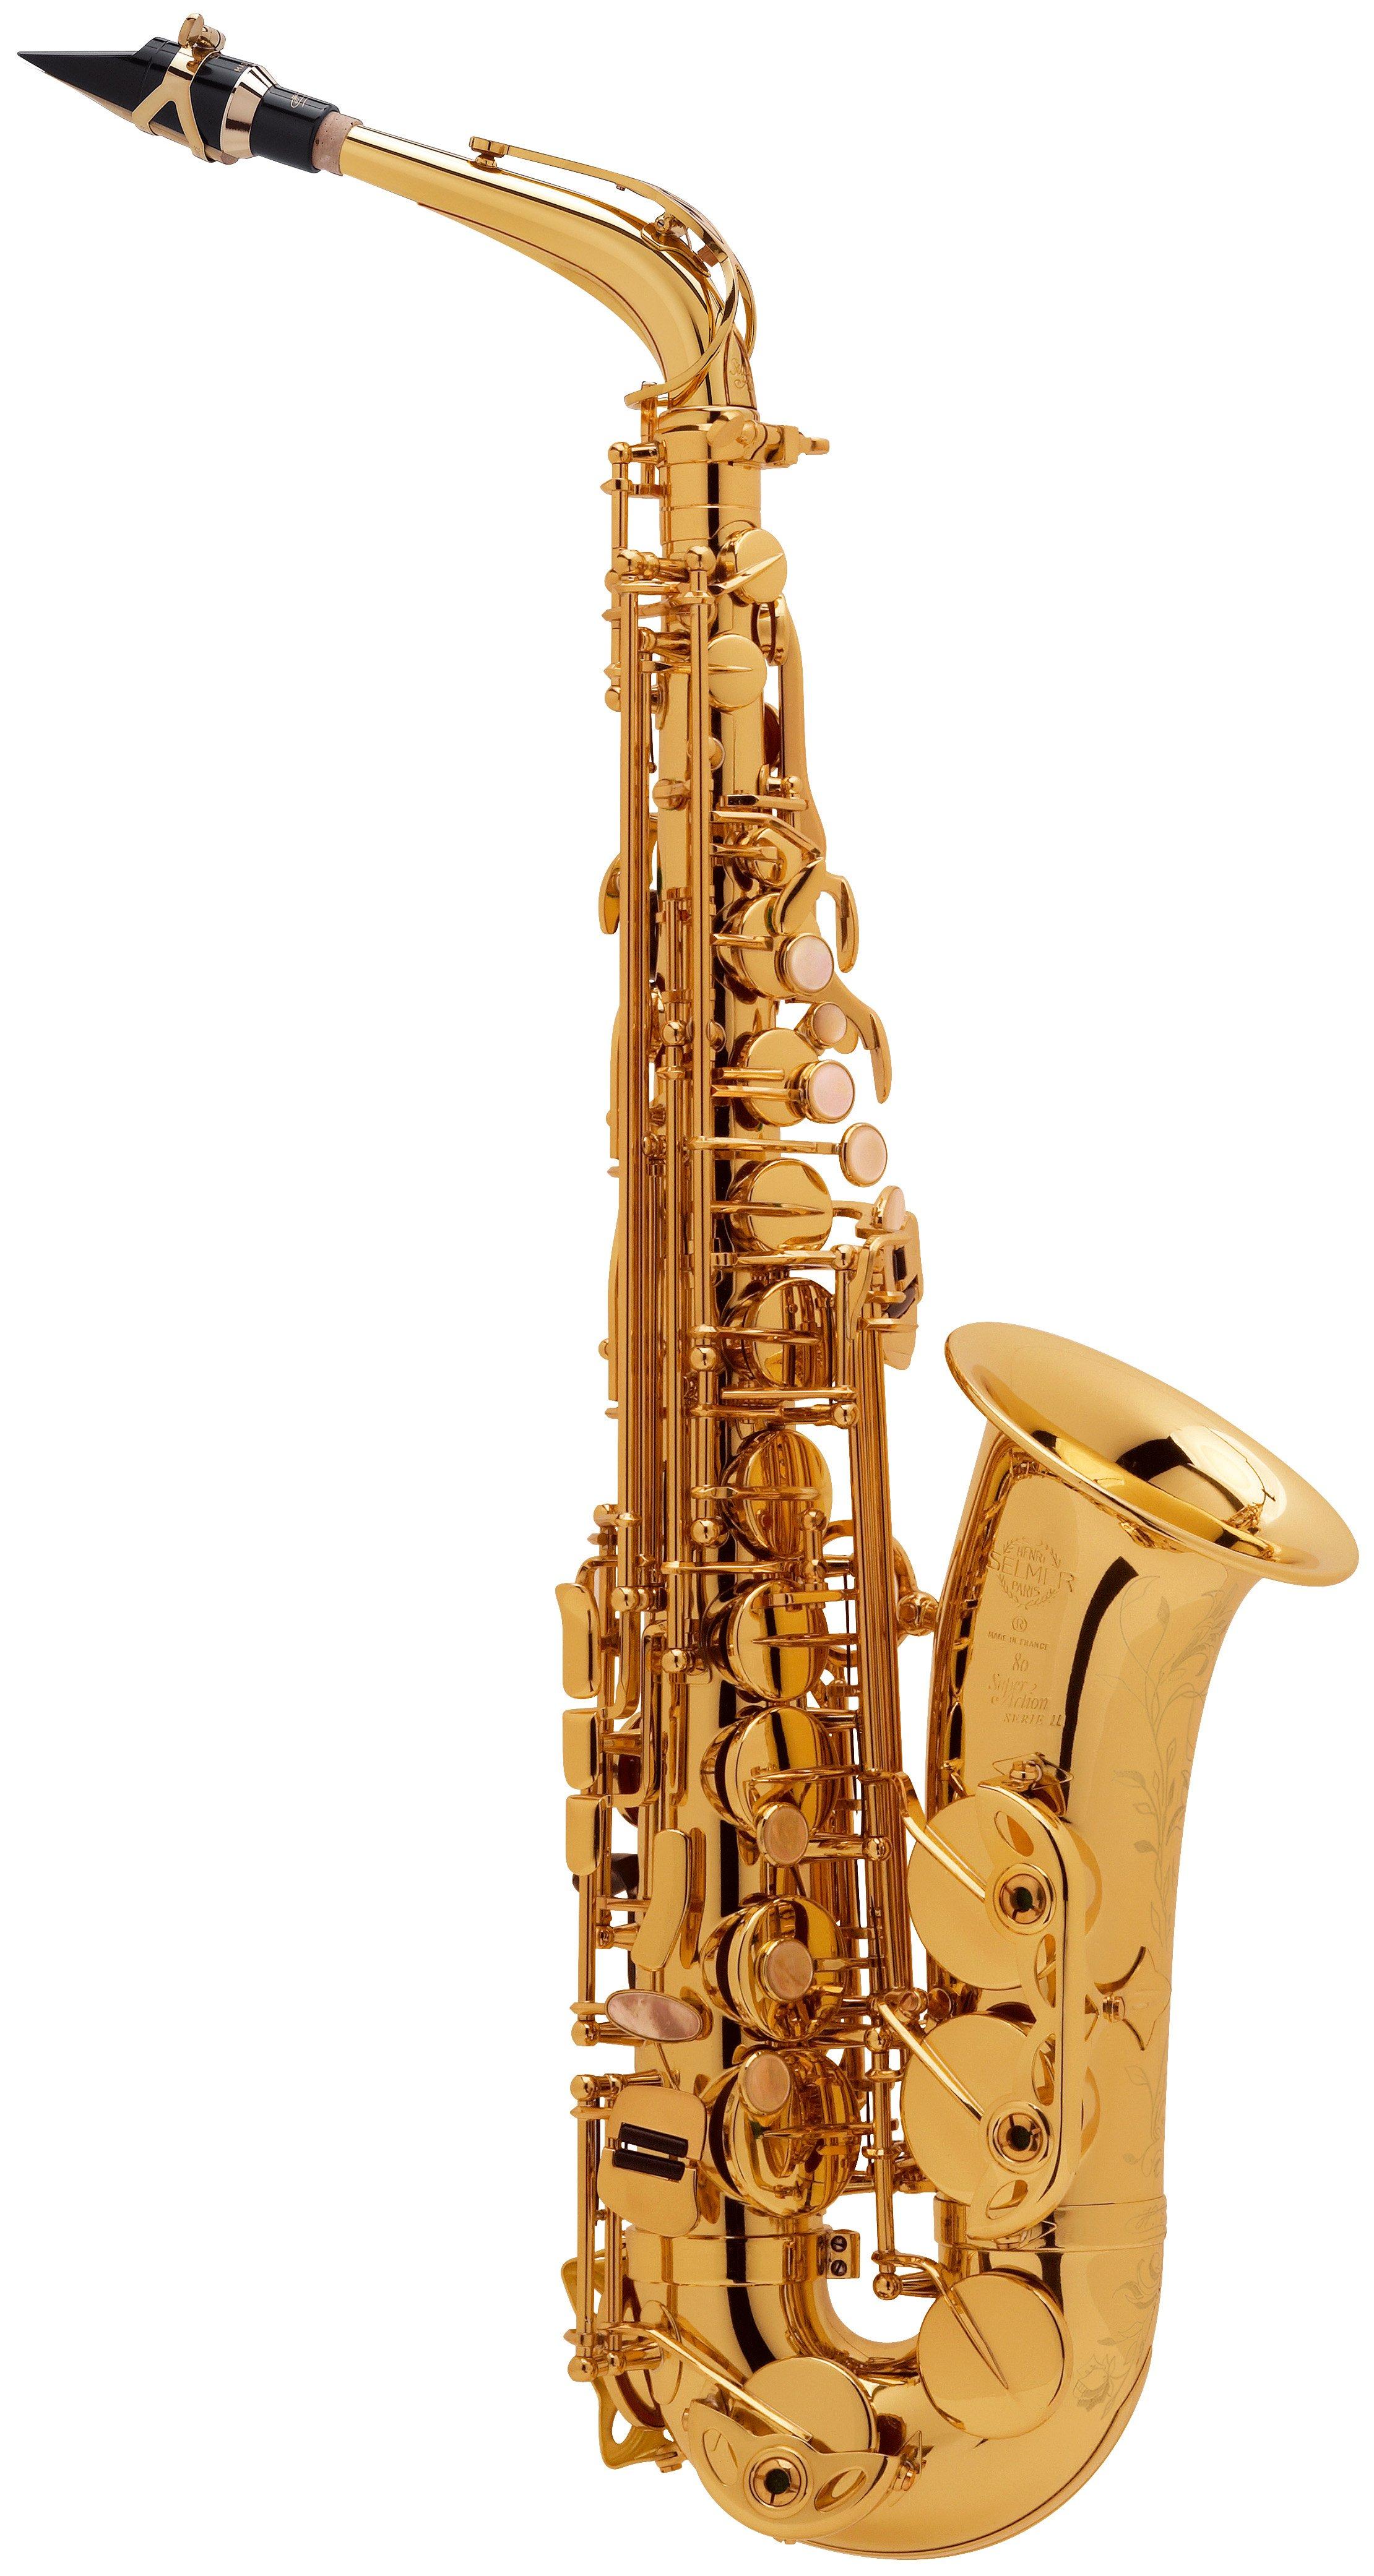 Selmer - SE - A - 2 - G - SET - / SA-80-II - Holzblasinstrumente - Saxophone | MUSIK BERTRAM Deutschland Freiburg